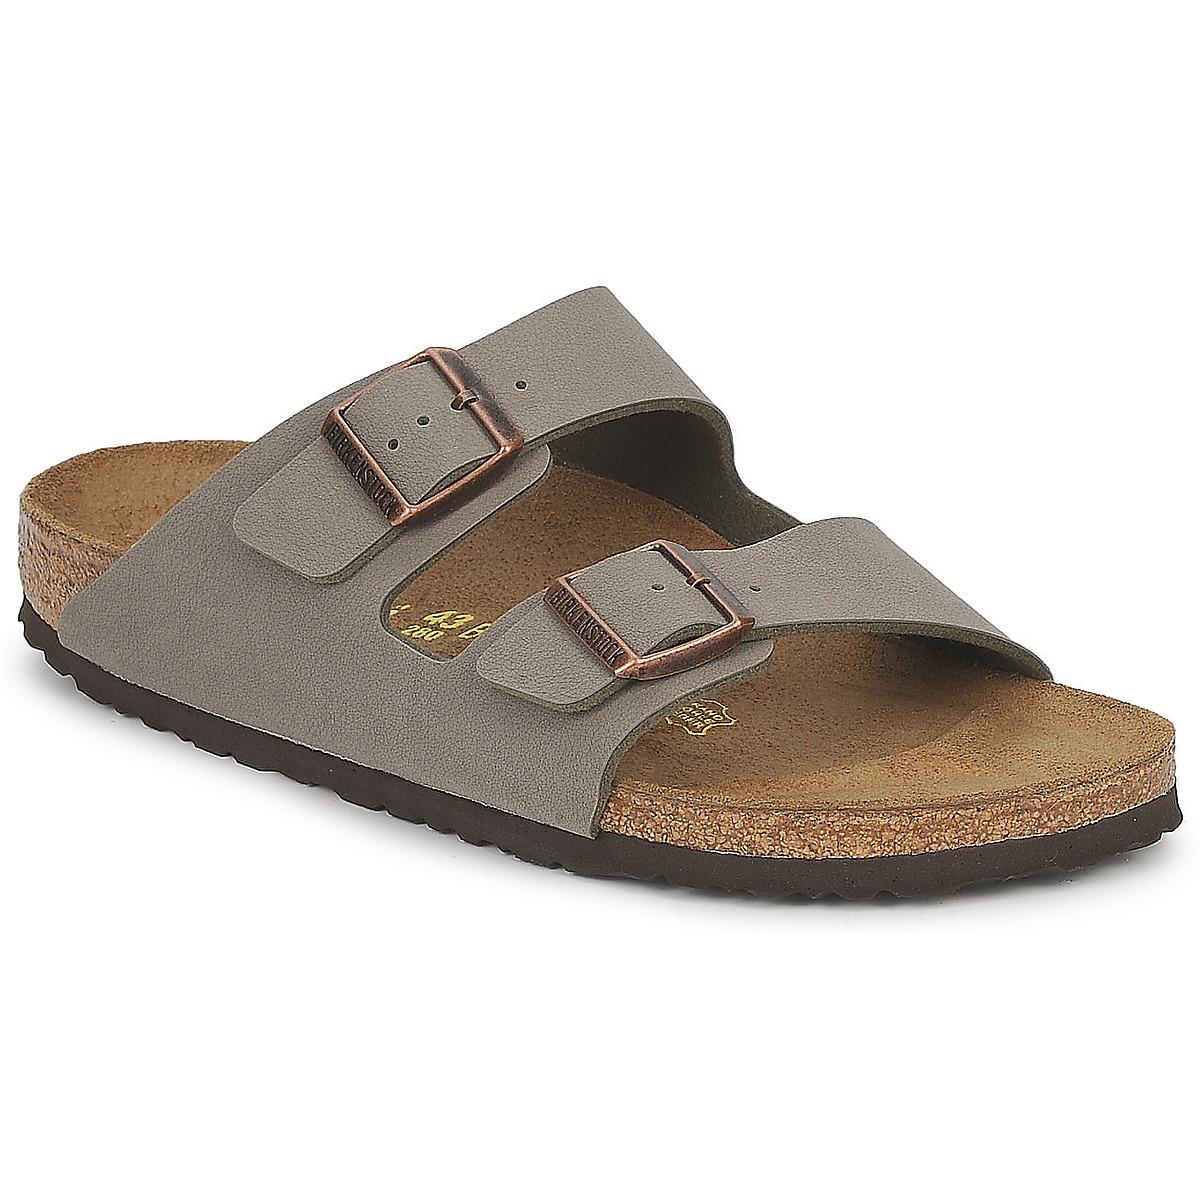 birkenstock arizona marron chaussure pas cher avec chaussures mules 74 99. Black Bedroom Furniture Sets. Home Design Ideas